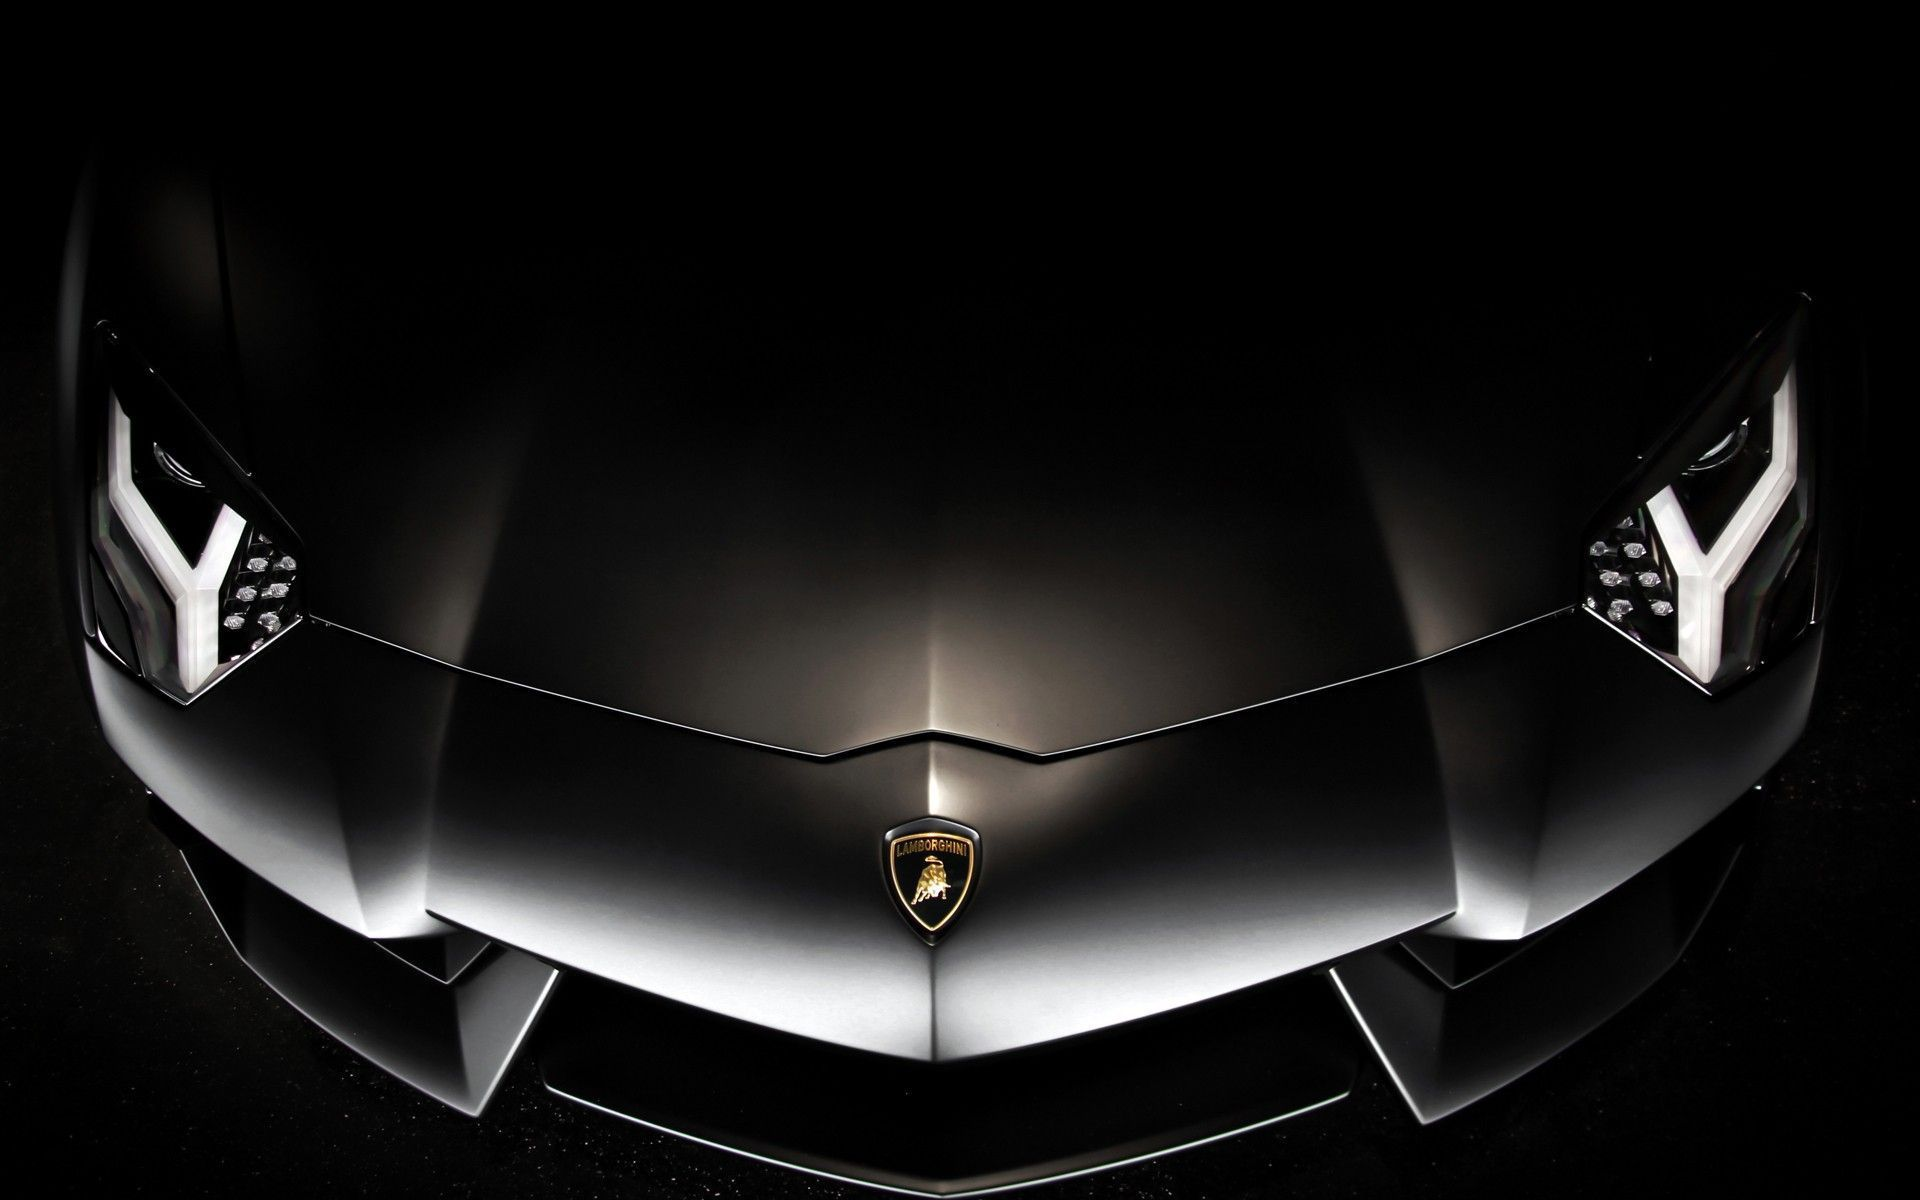 Attrayant Lamborghini Aventador Wallpapers   Full HD Wallpaper Search